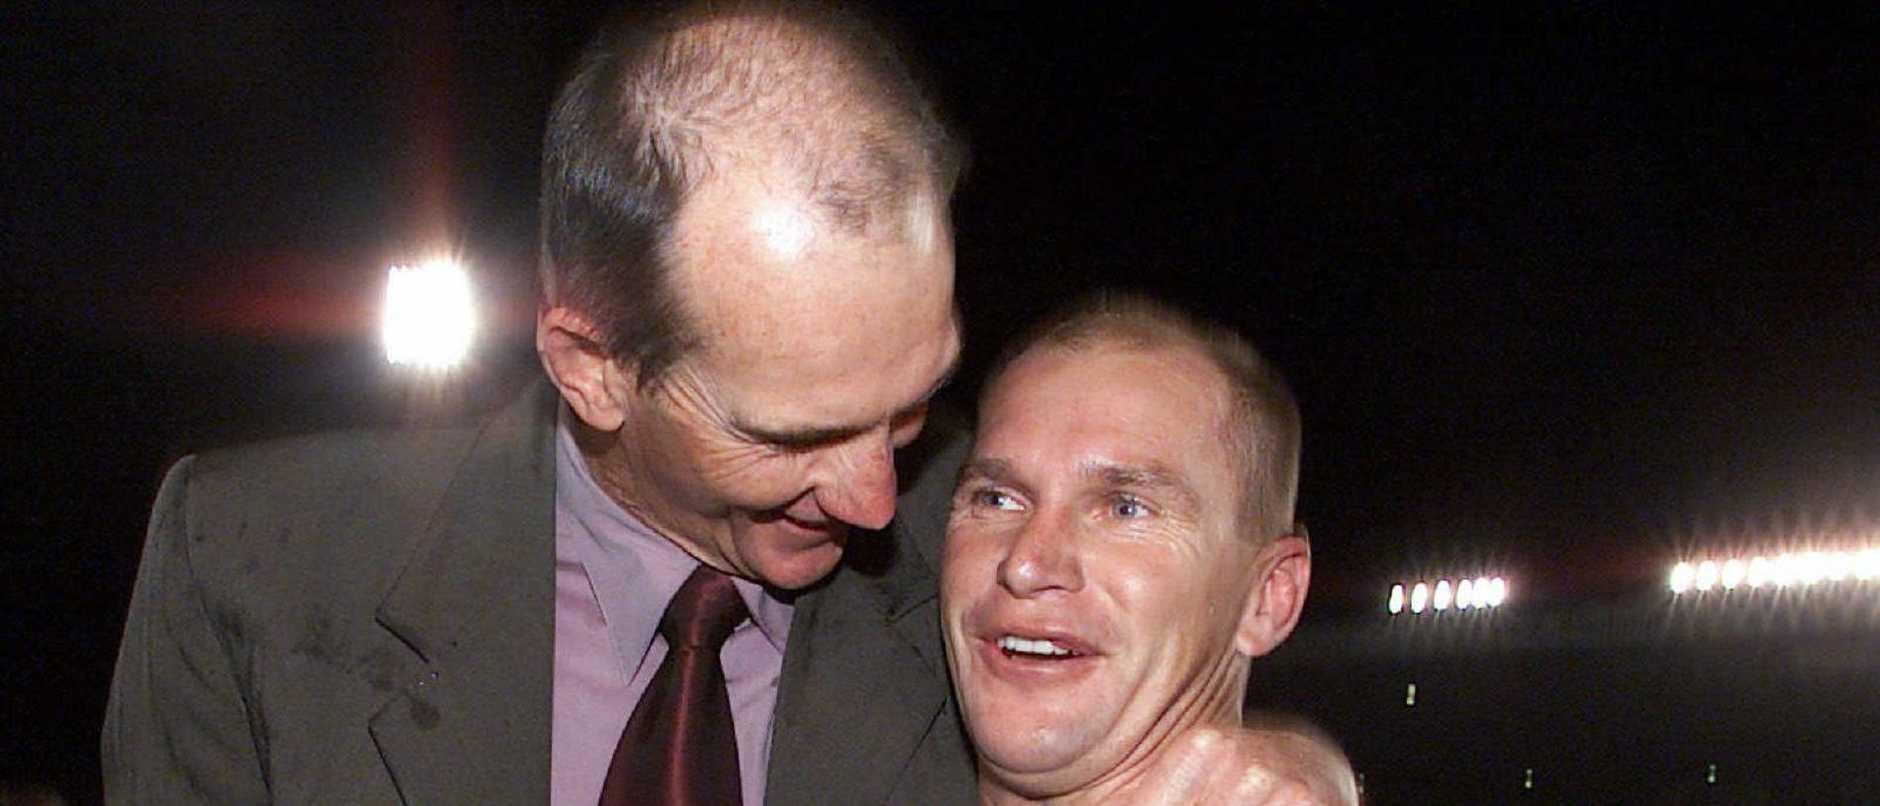 01/07/2001. A smiling Maroons coach Wayne Bennett embraces Alf Langer. Queensland v NSW State of Origin at ANZ Stadium.